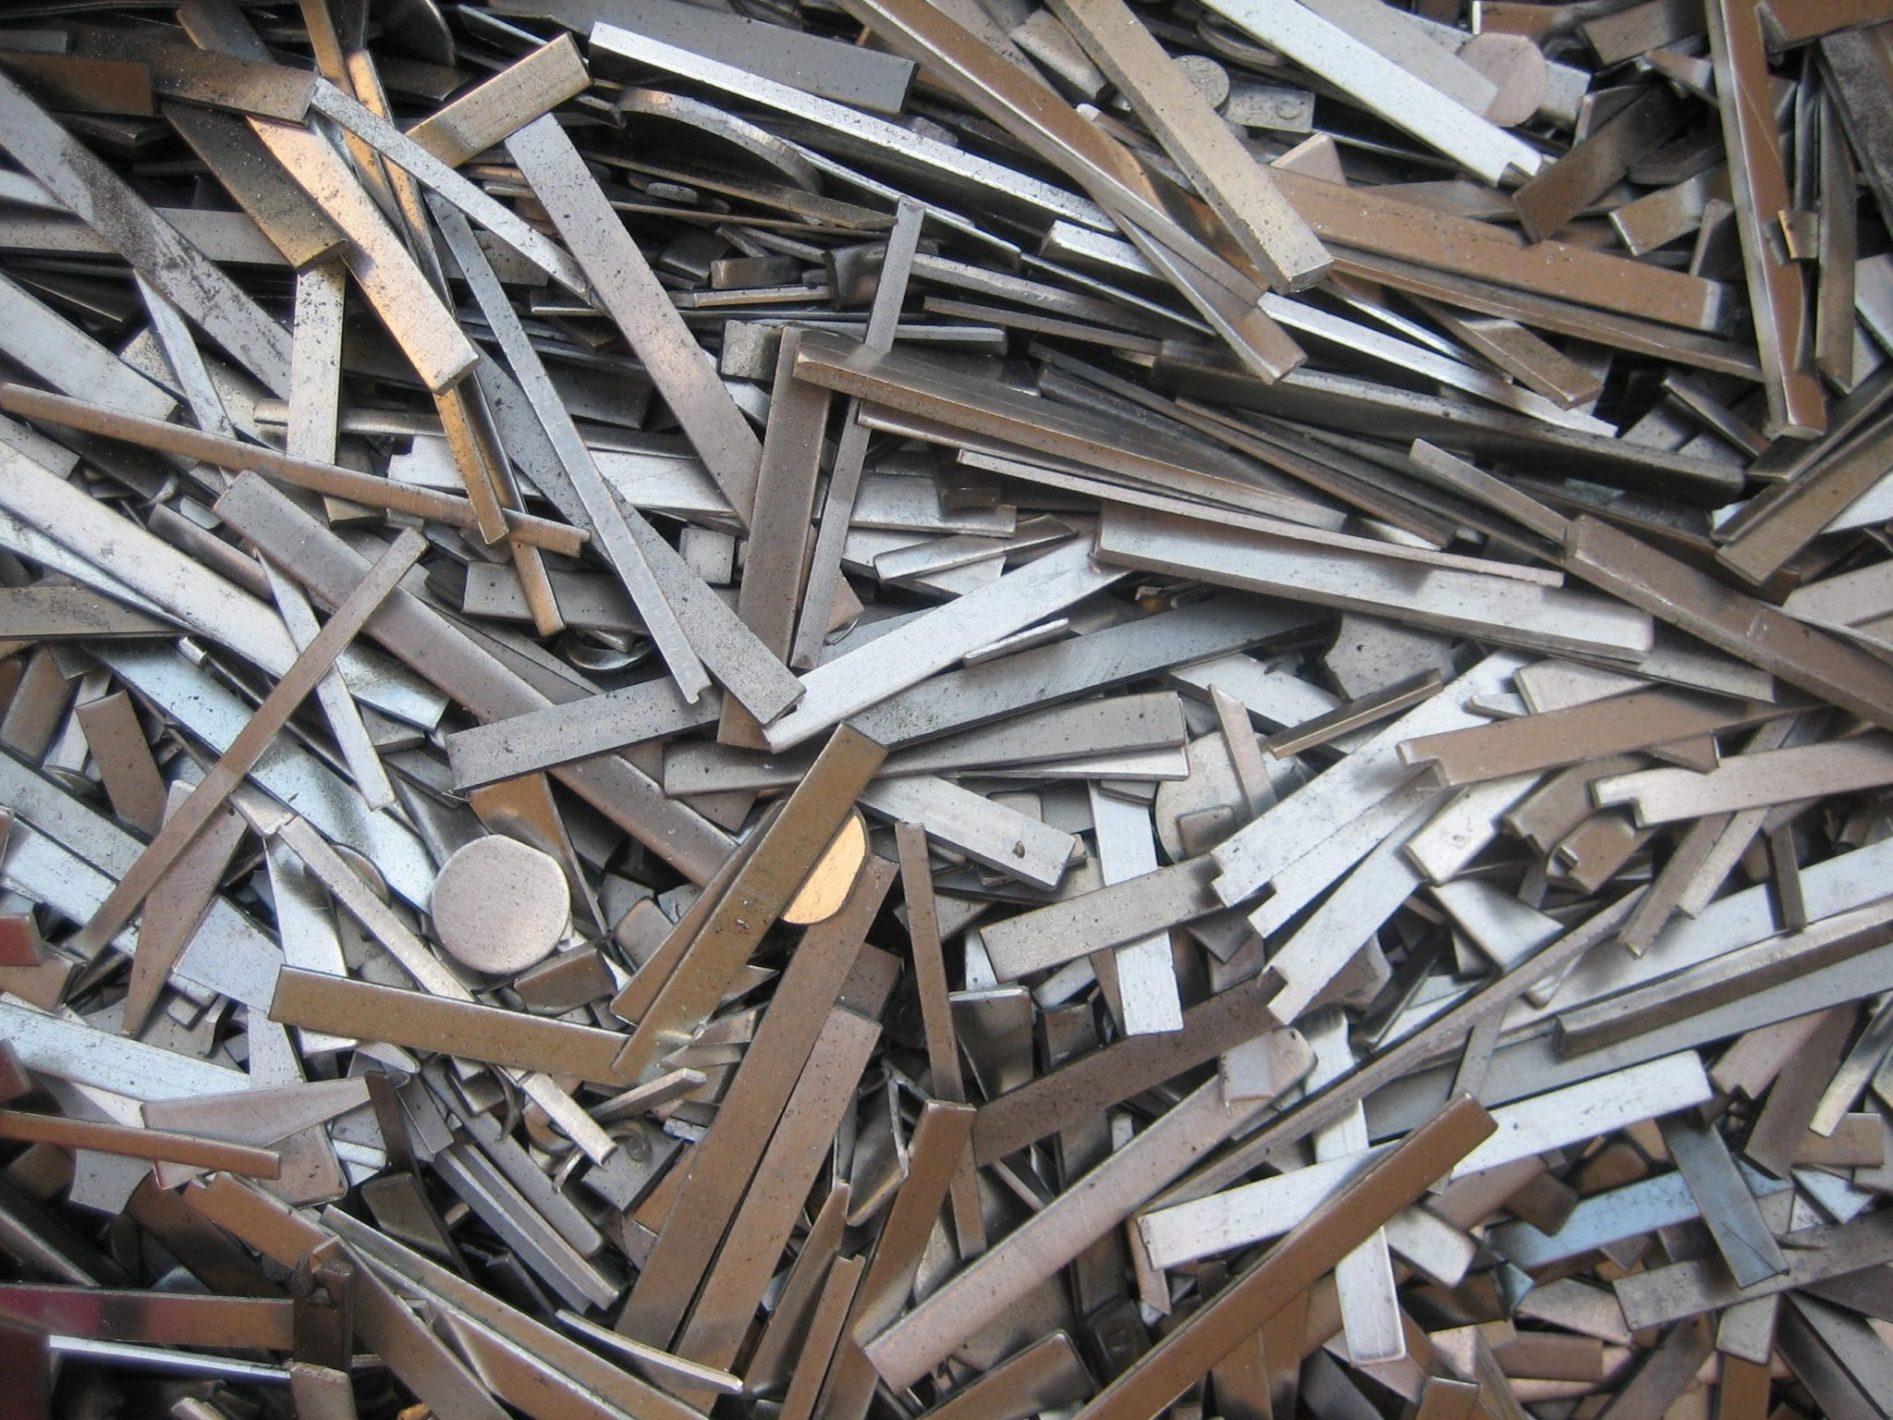 Metal Recycling, Steel, Copper, Tin Recycling | Main Street Fibers ...